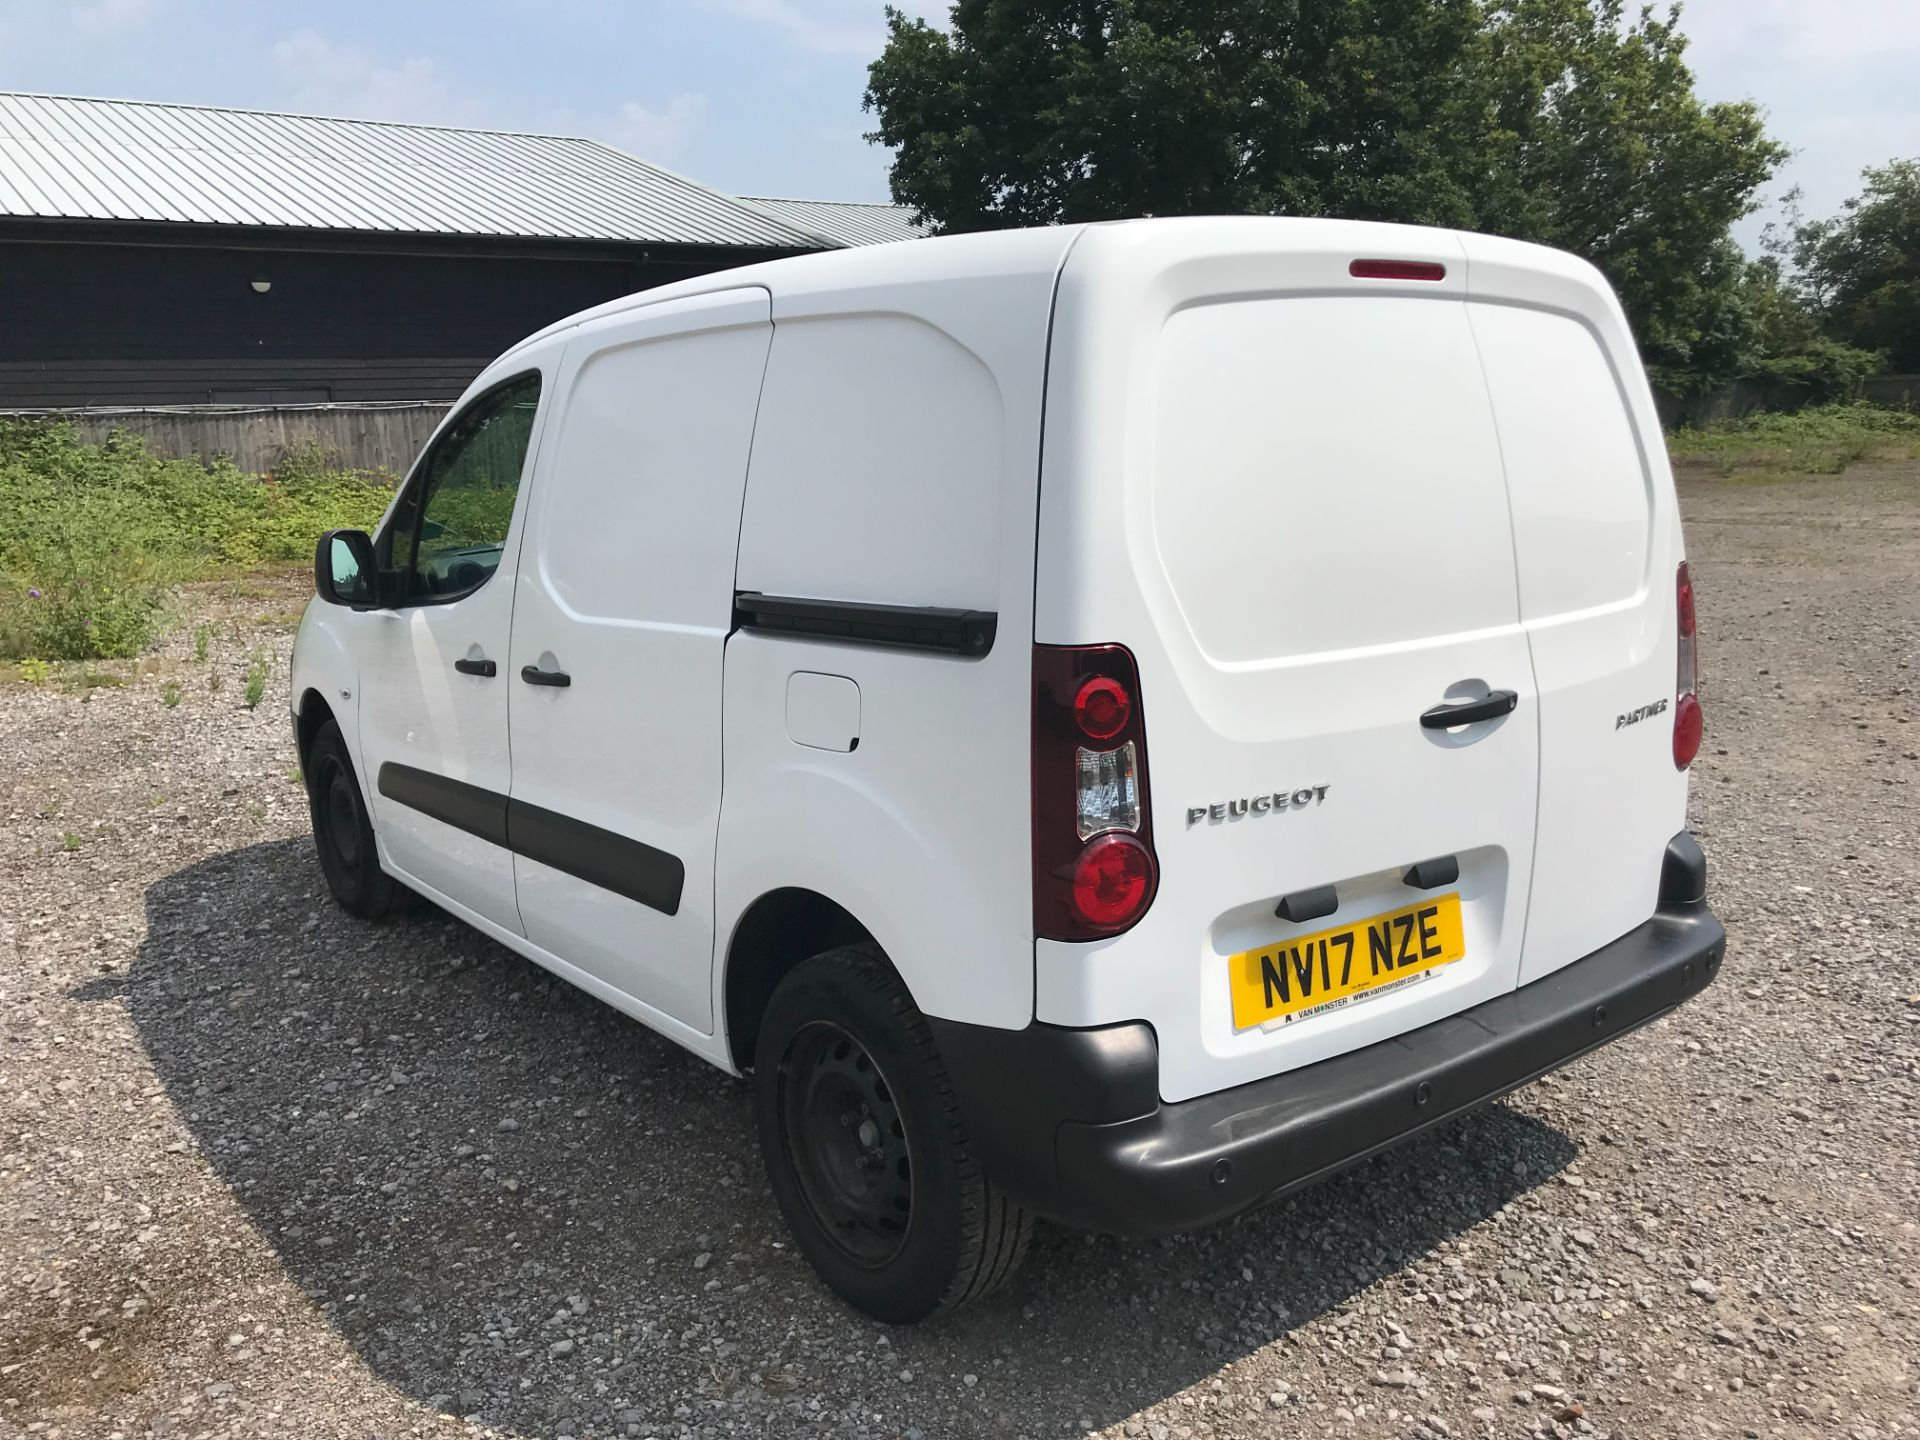 2017 Peugeot Partner 850 1.6 Bluehdi 100 Professional Van [Non Ss] EURO 6 (NV17NZE) Image 6